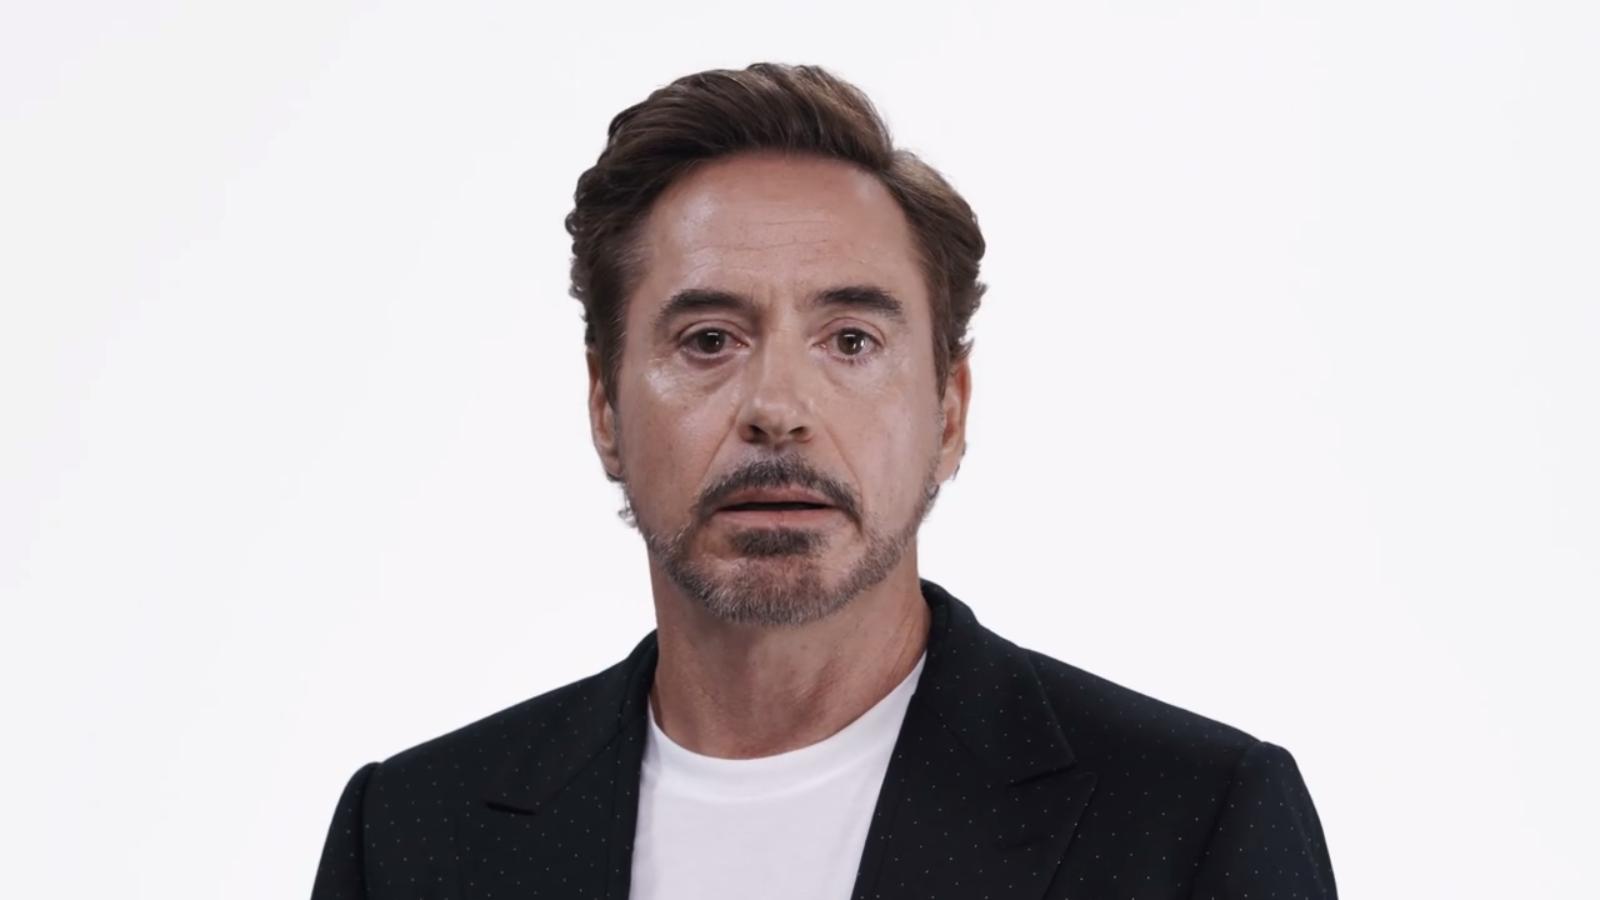 Joss Whedon se reúne con Avengers en video anti Donald Trump